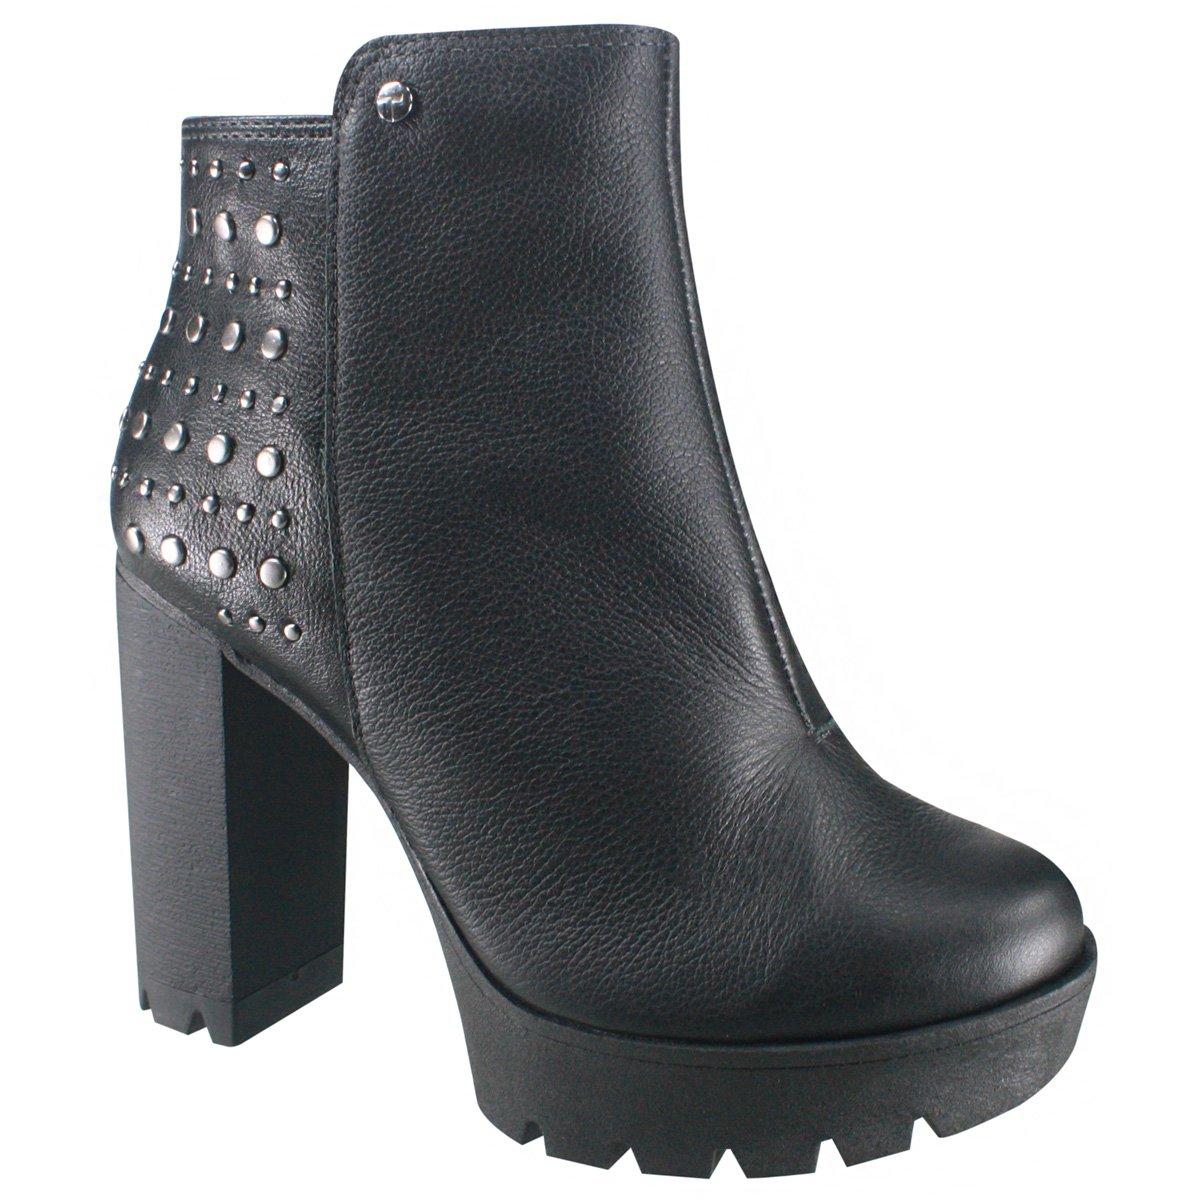 963379bc8 Bota Ankle Boot Tanara em Couro T2365 0001 - Preto (Scarssi) - Botas ...